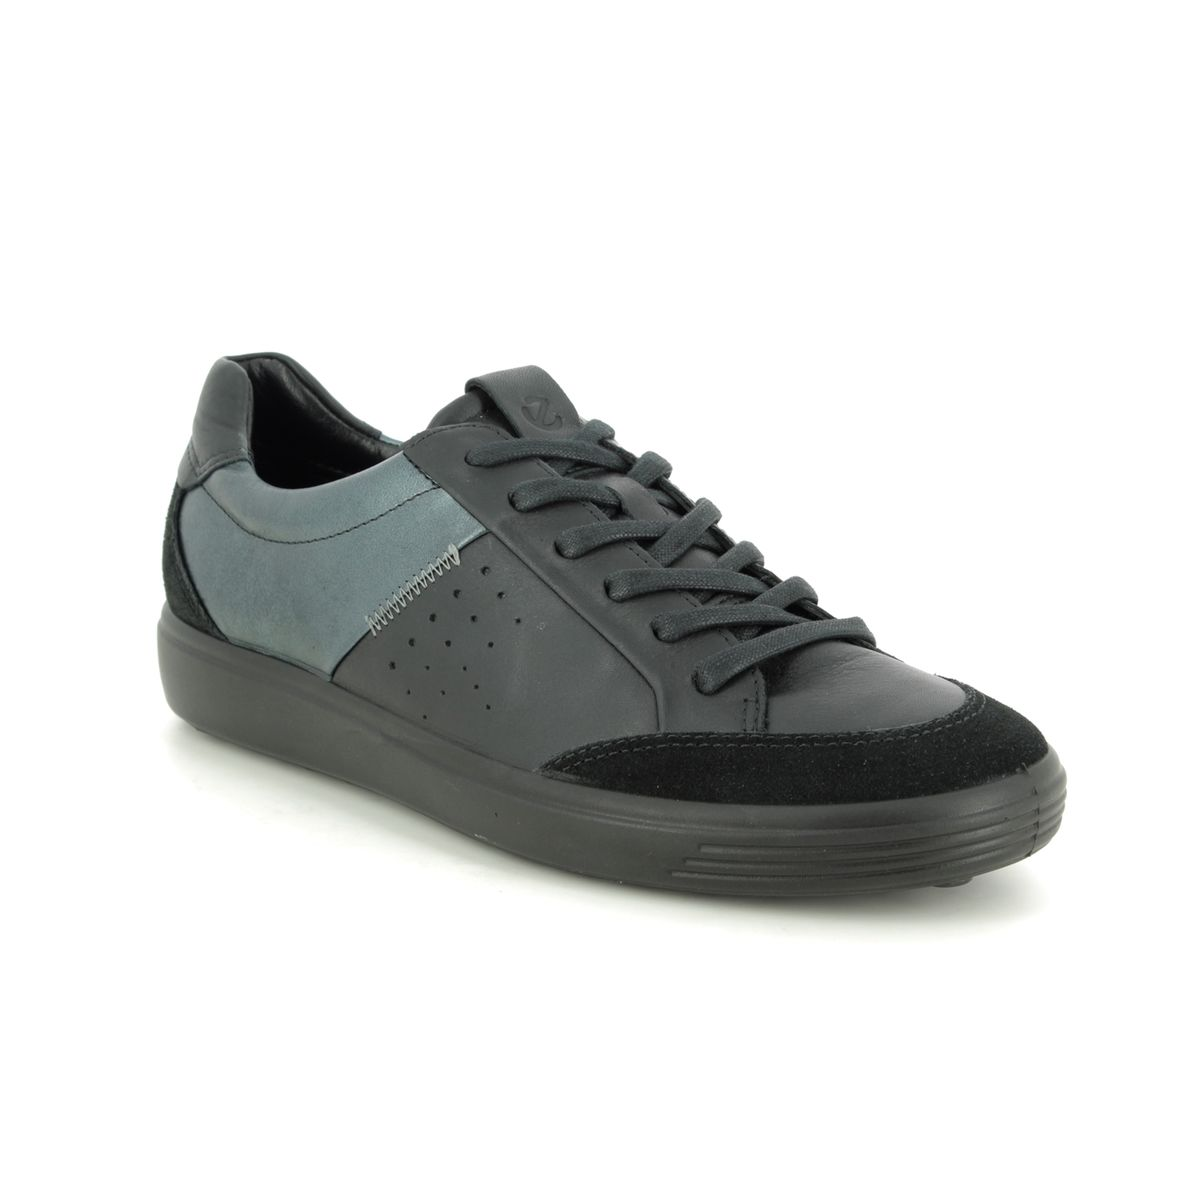 ECCO Soft 7 Stitch 430723-51094 Black